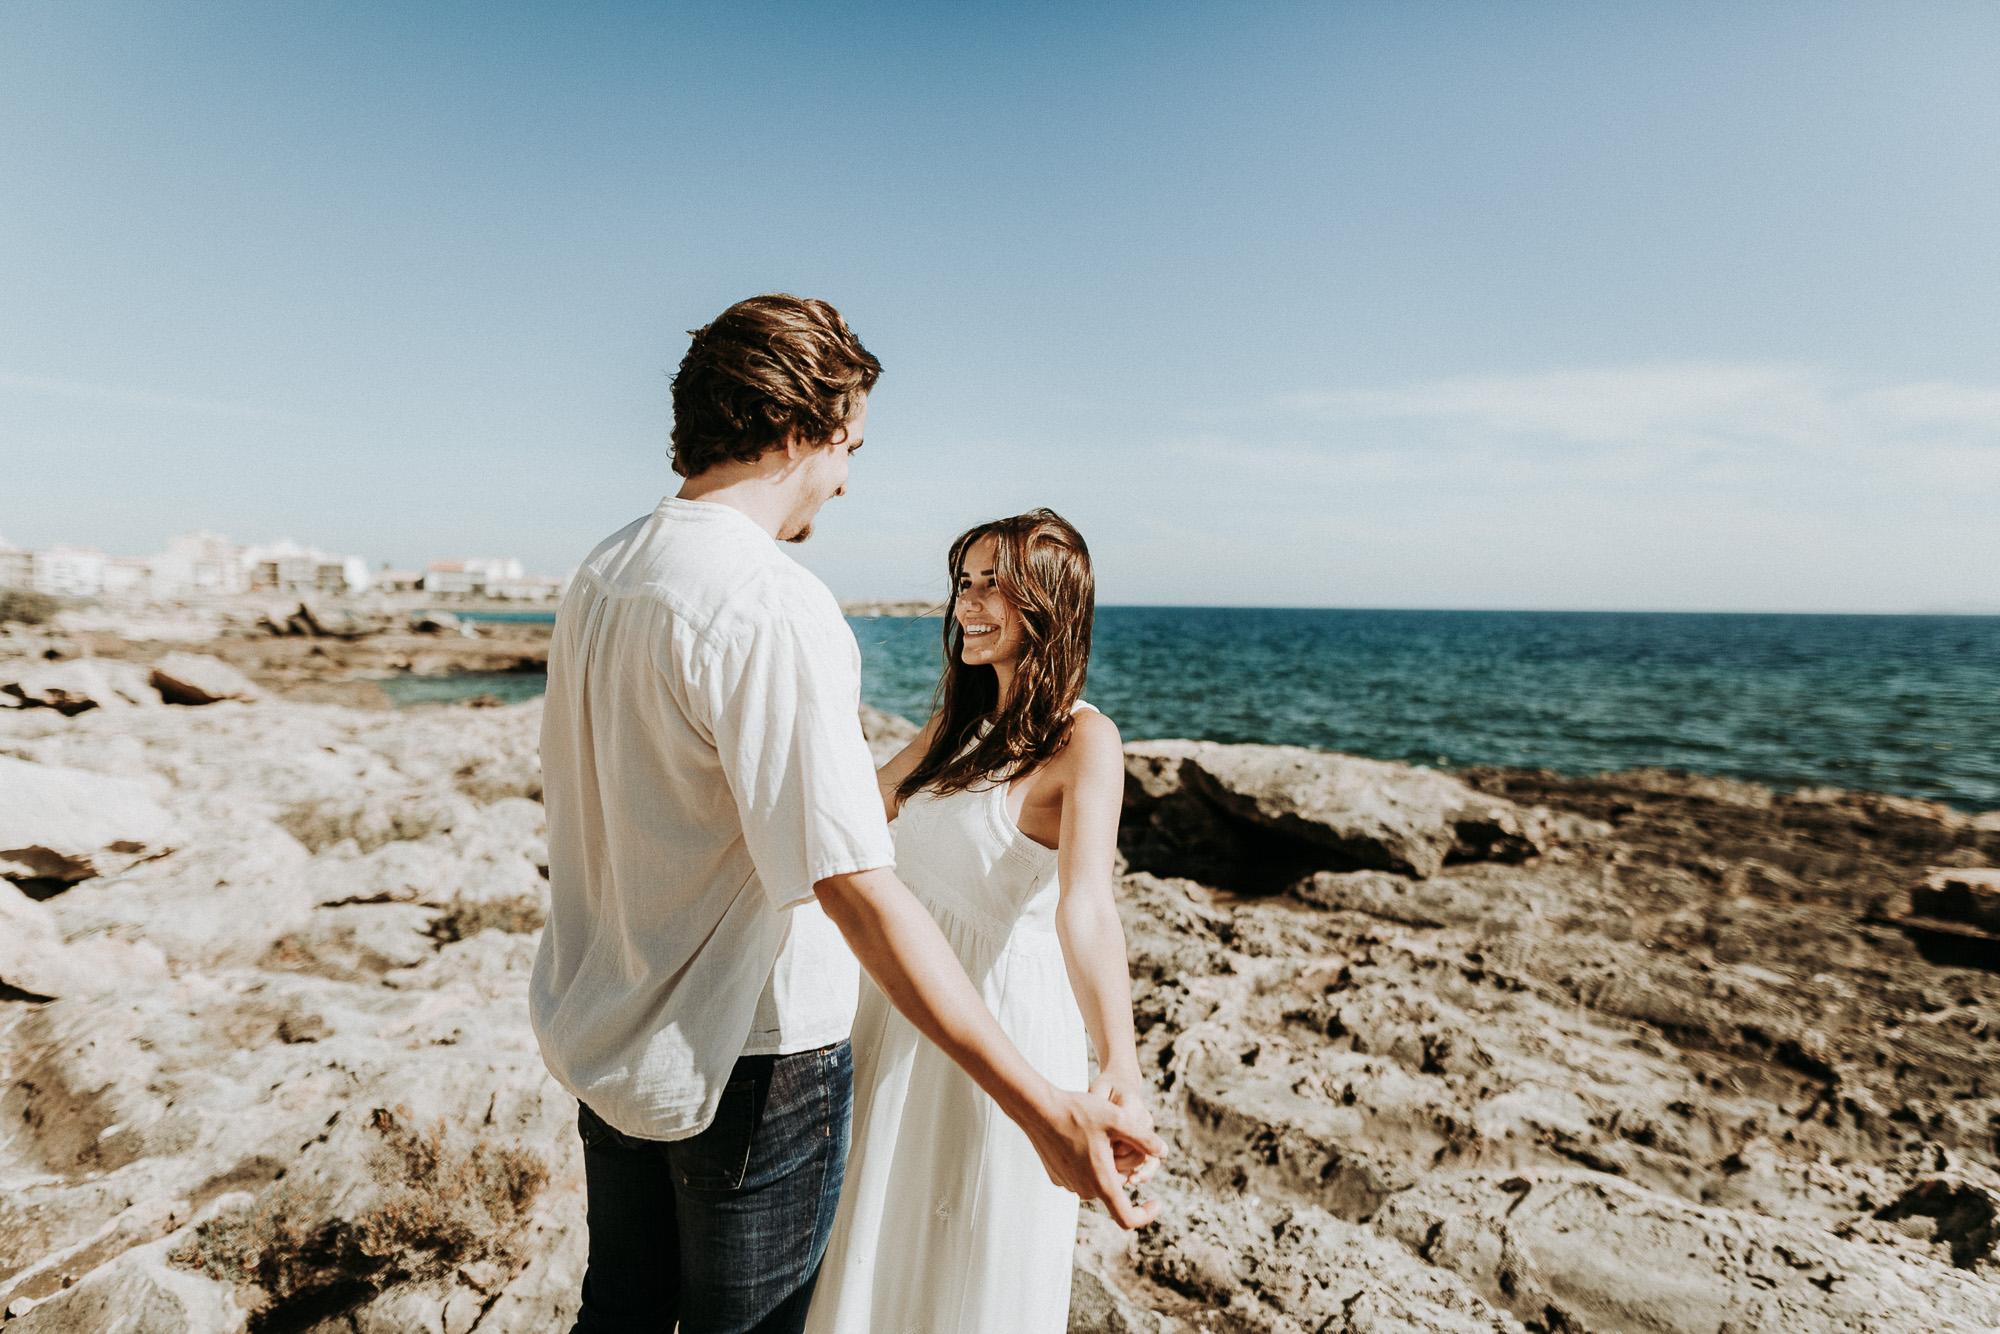 DanielaMarquardtPhotography_wedding_elopement_mallorca_spain_stjordi_sessalines_marinaandxavi387